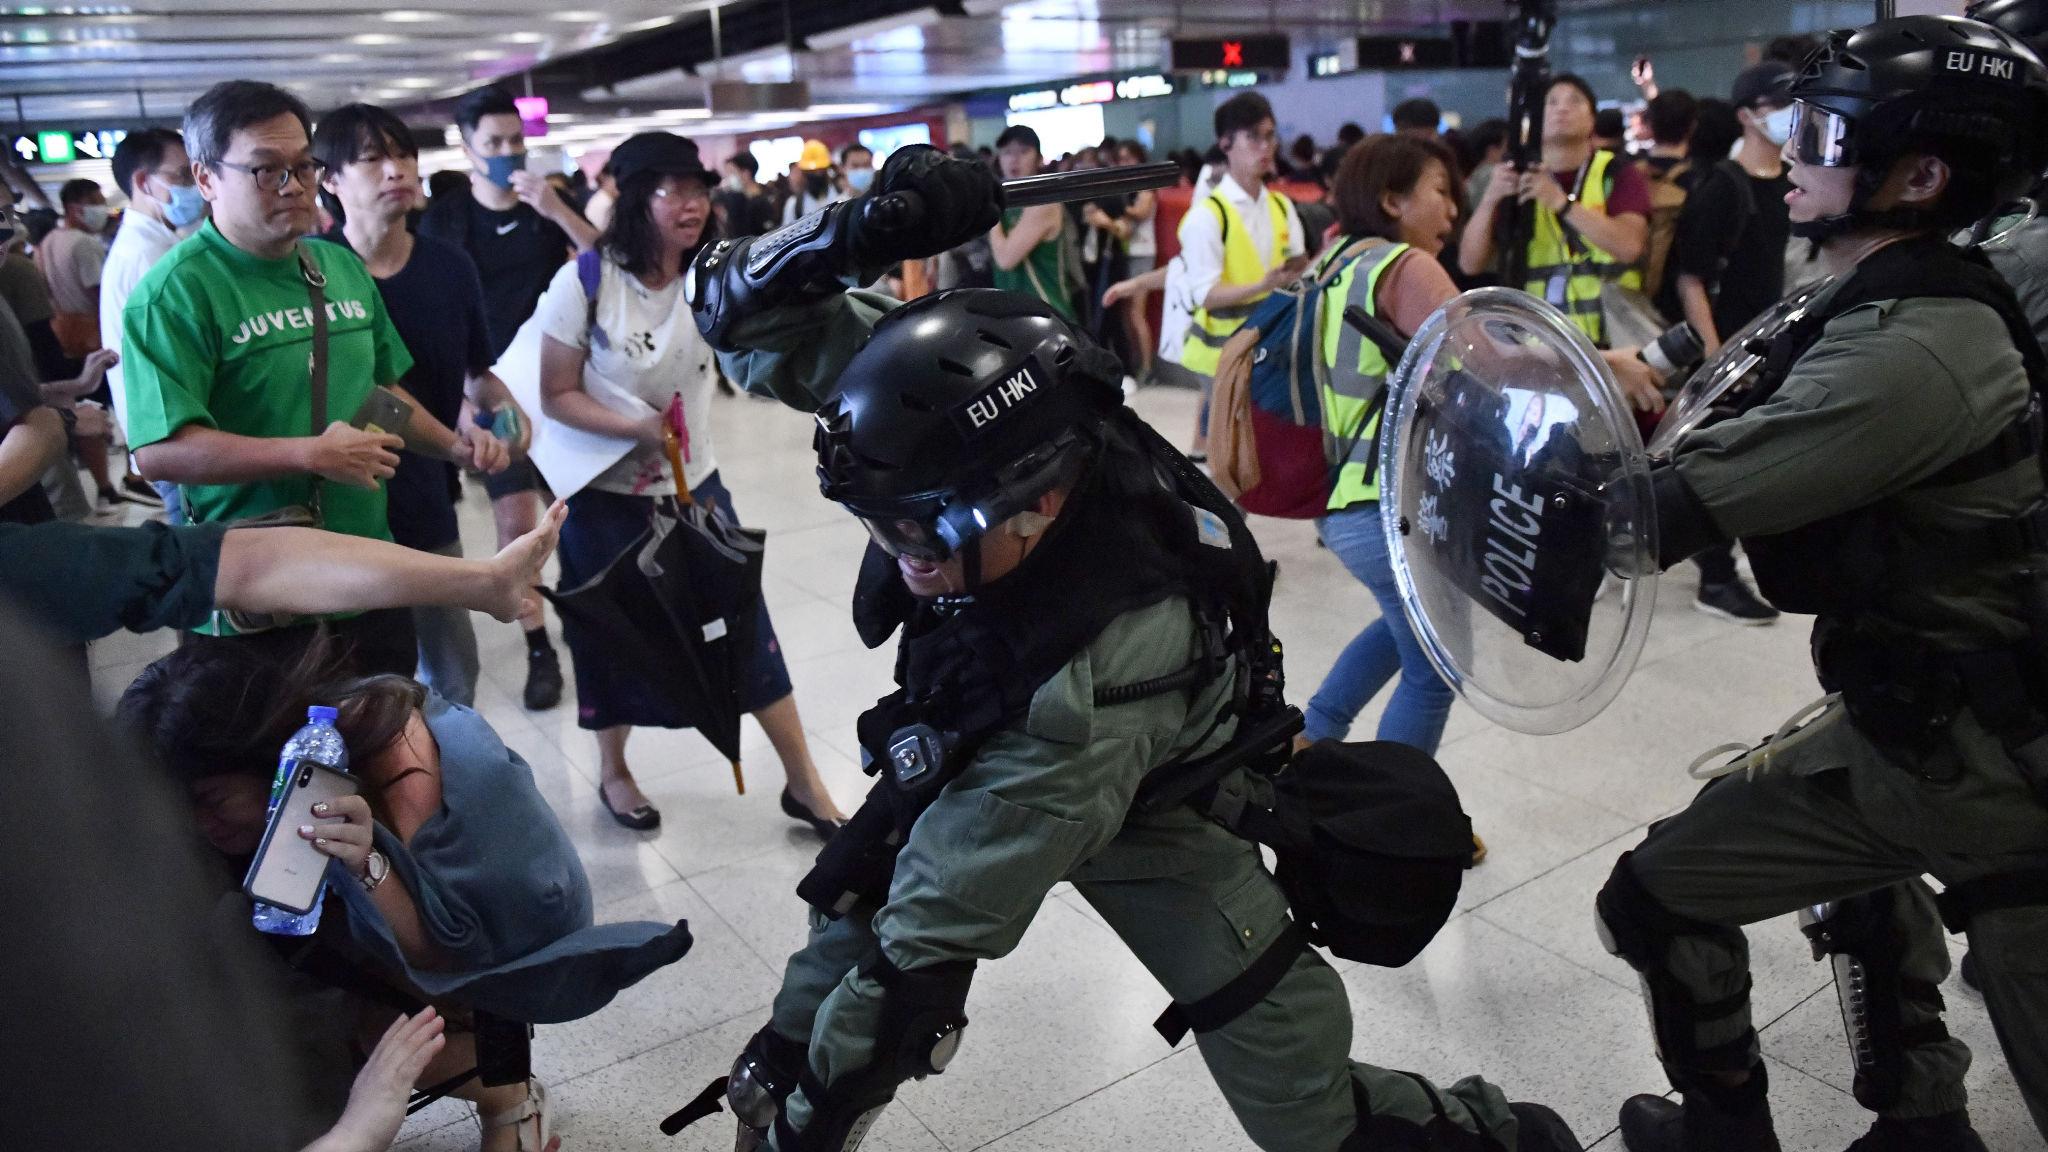 20191204 police brutality.jpg